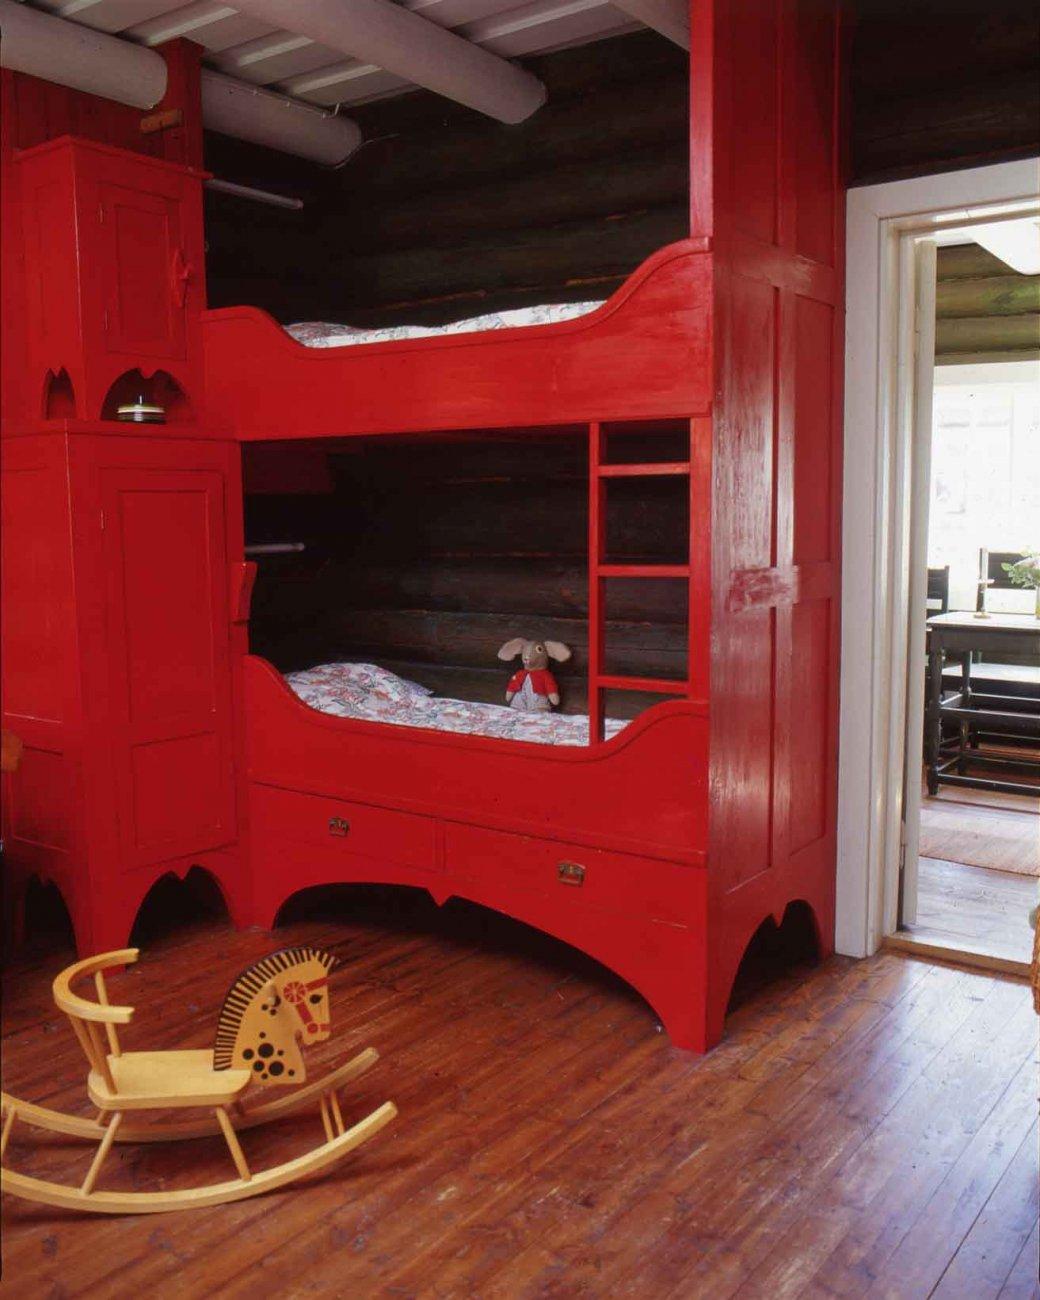 Sarvilinna-punainen-kerrossanky-0.jpg